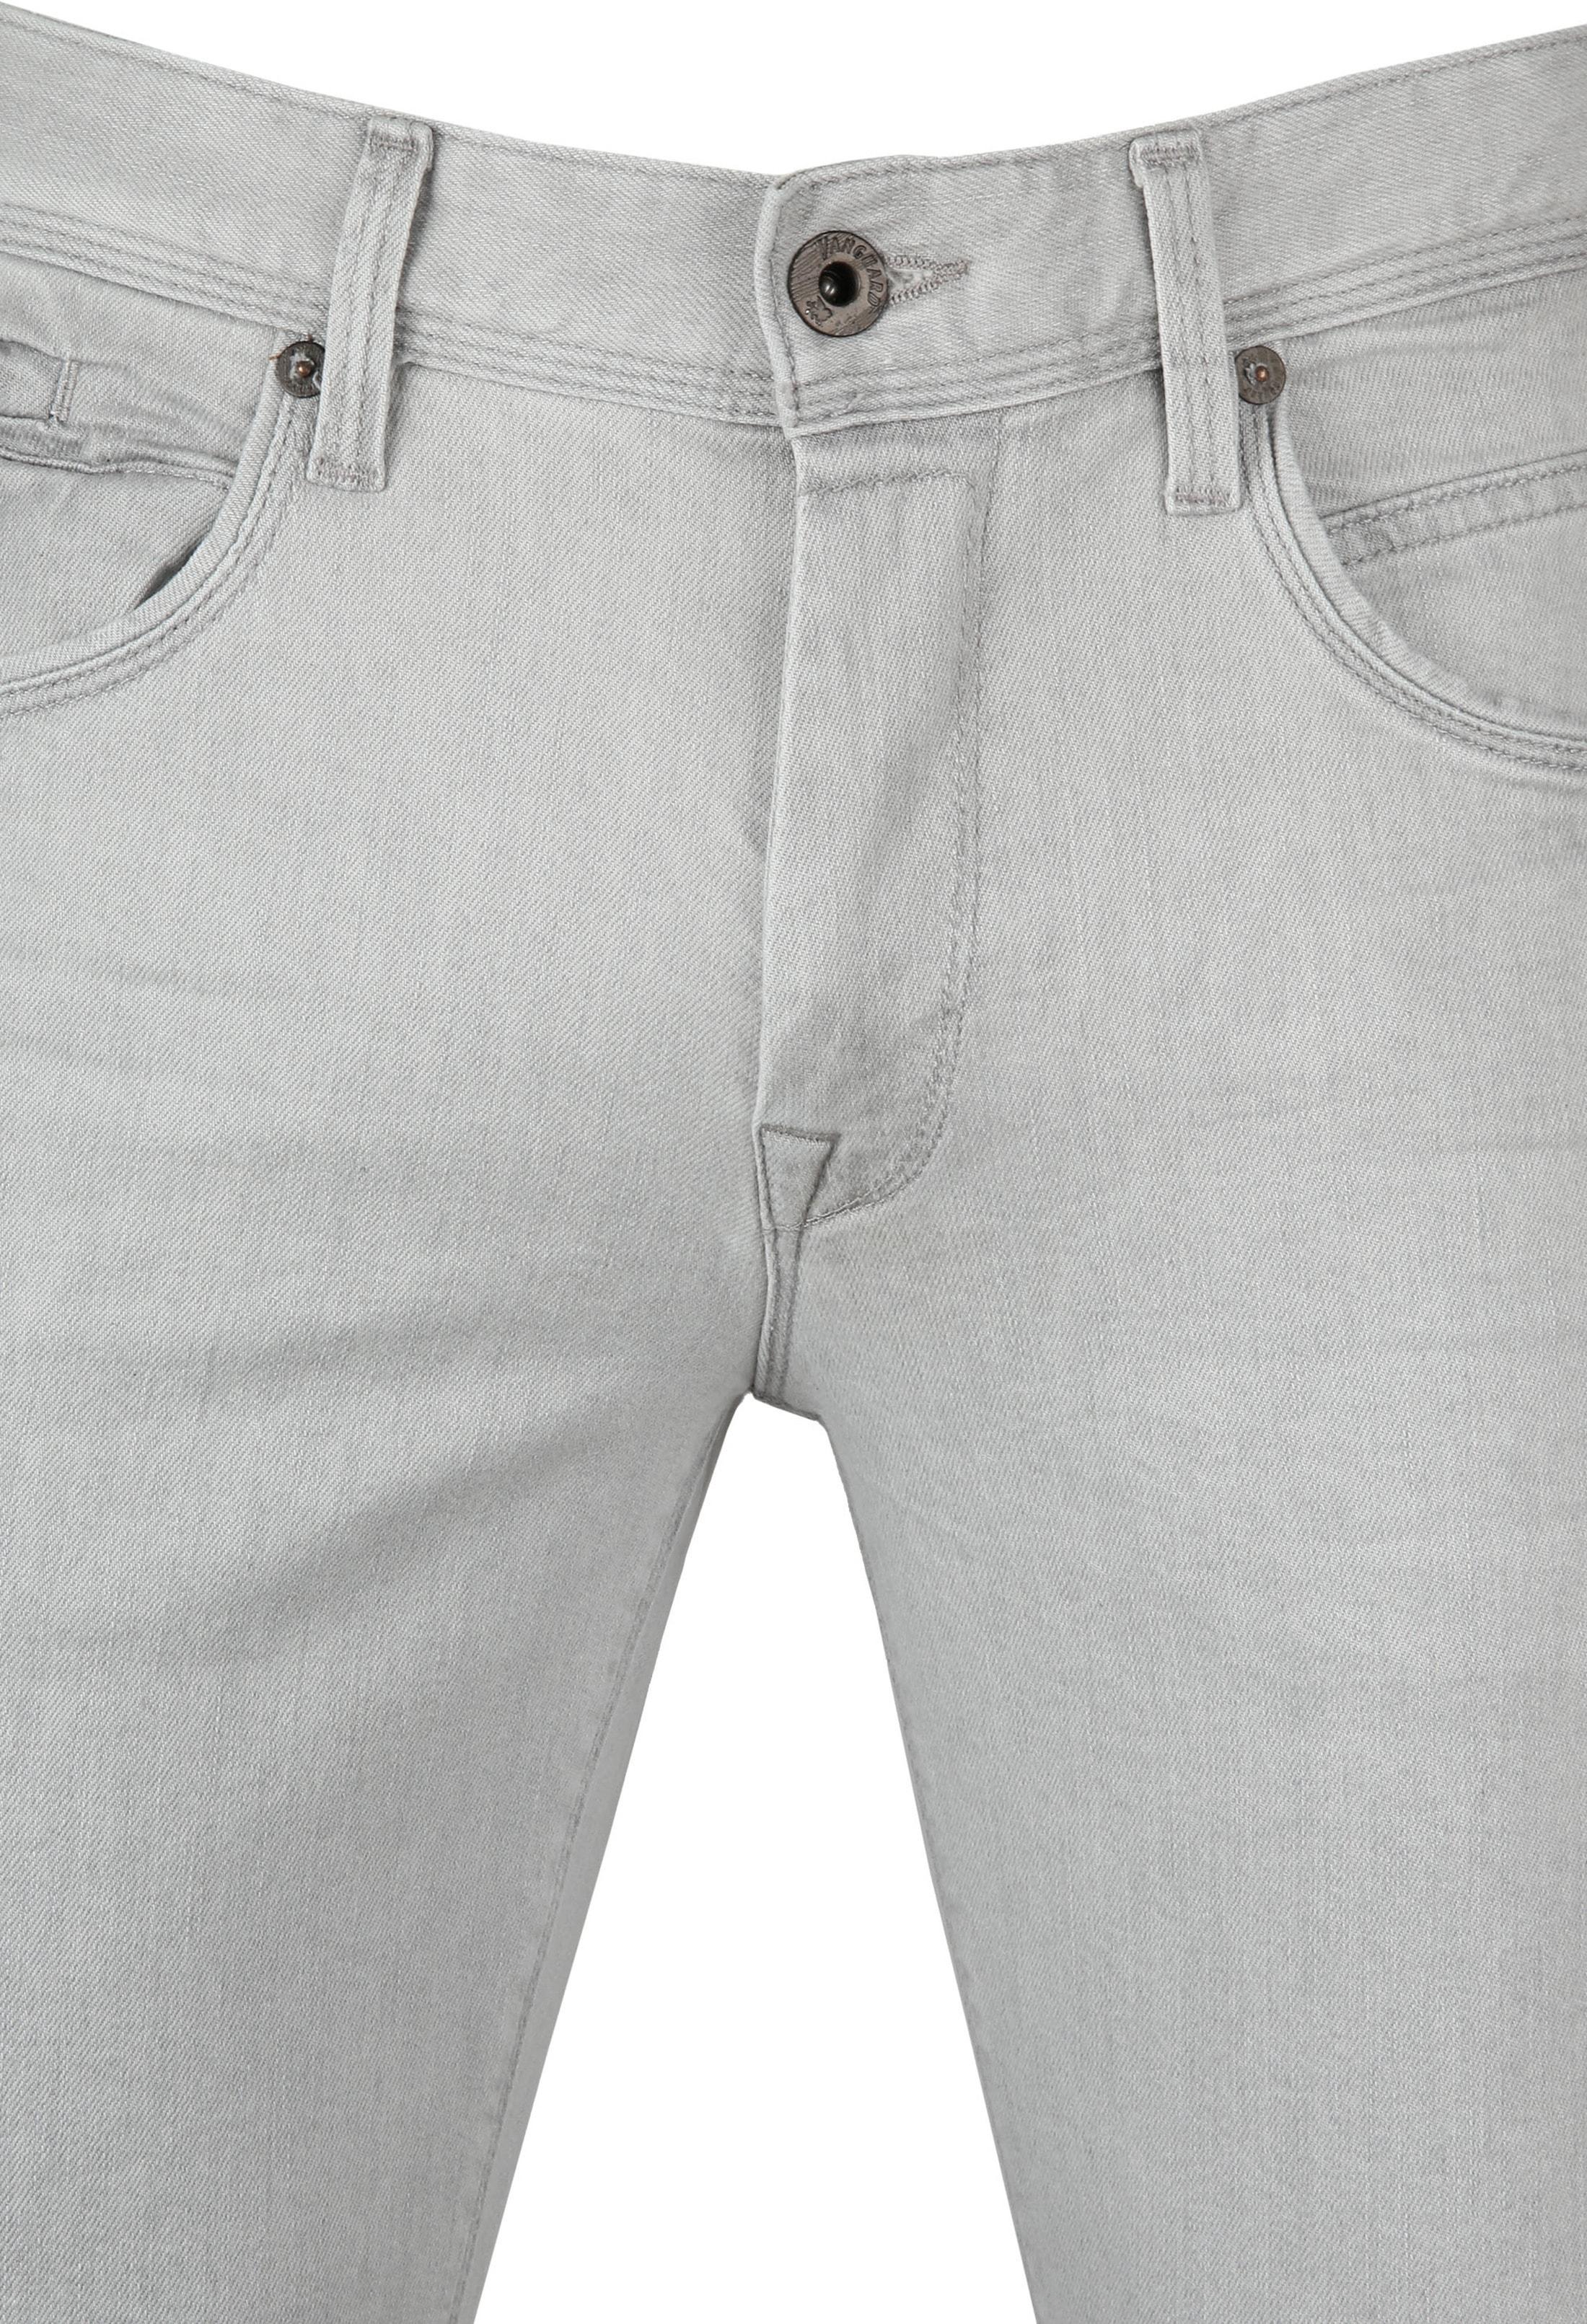 Vanguard V850 Rider Jeans Grey foto 2